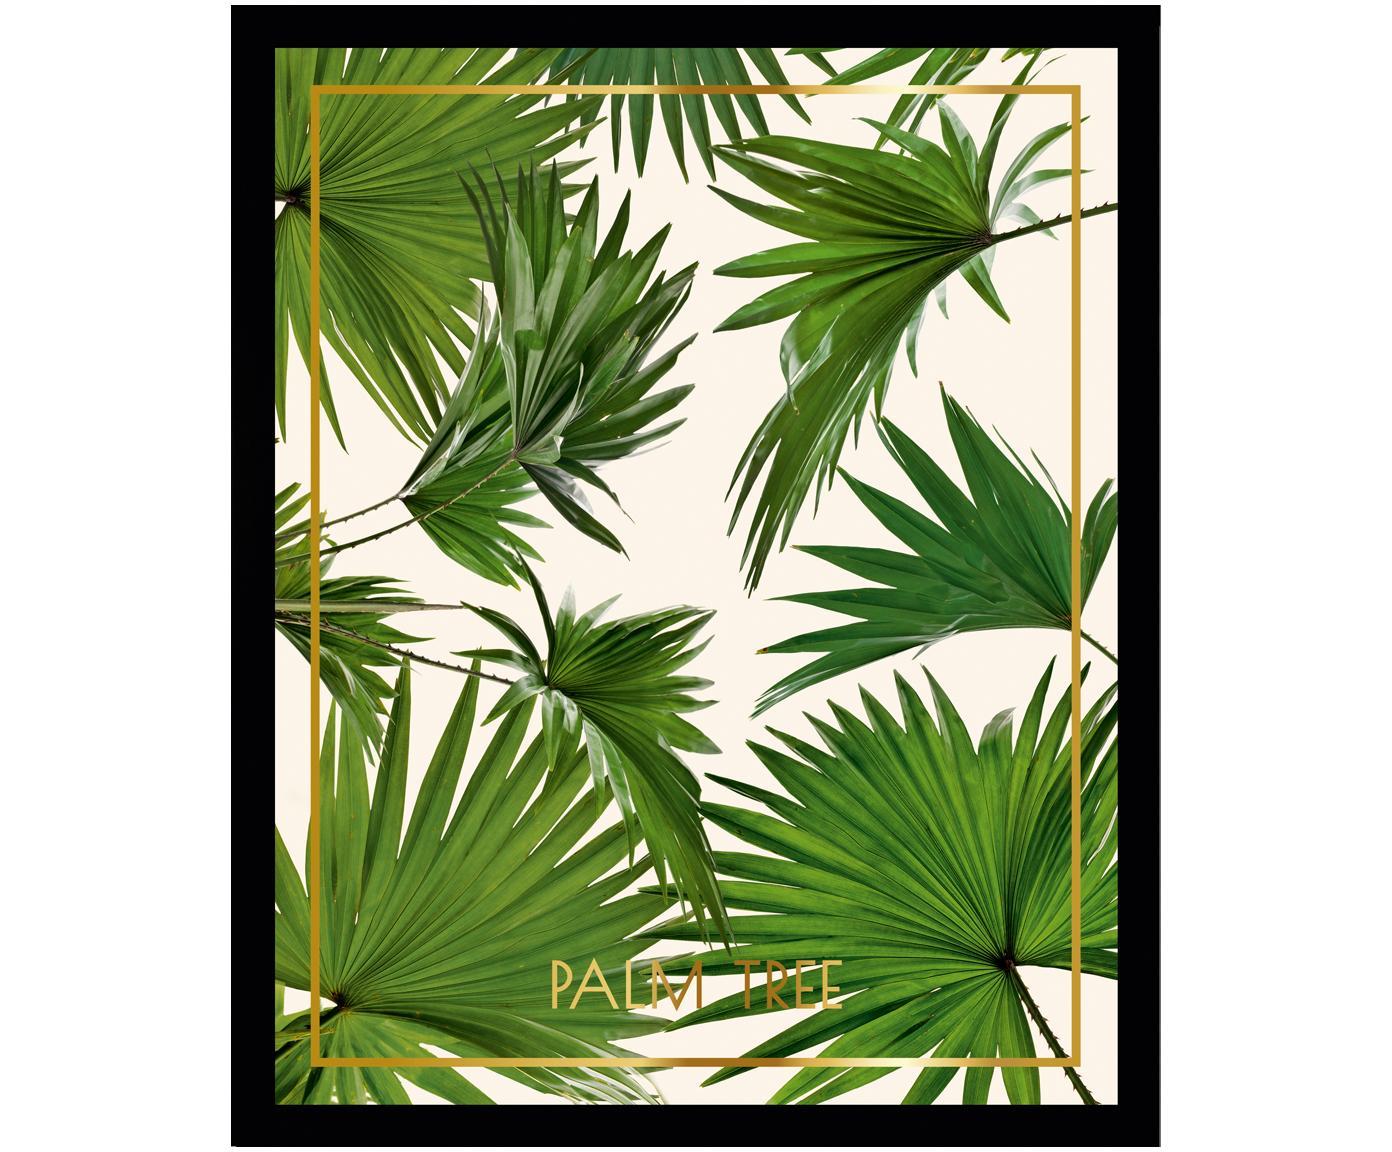 Gerahmter Digitaldruck Palm Tree I, Bild: Digitaldruck, Rahmen: Kunststoffrahmen mit Glas, Mehrfarbig, 30 x 40 cm